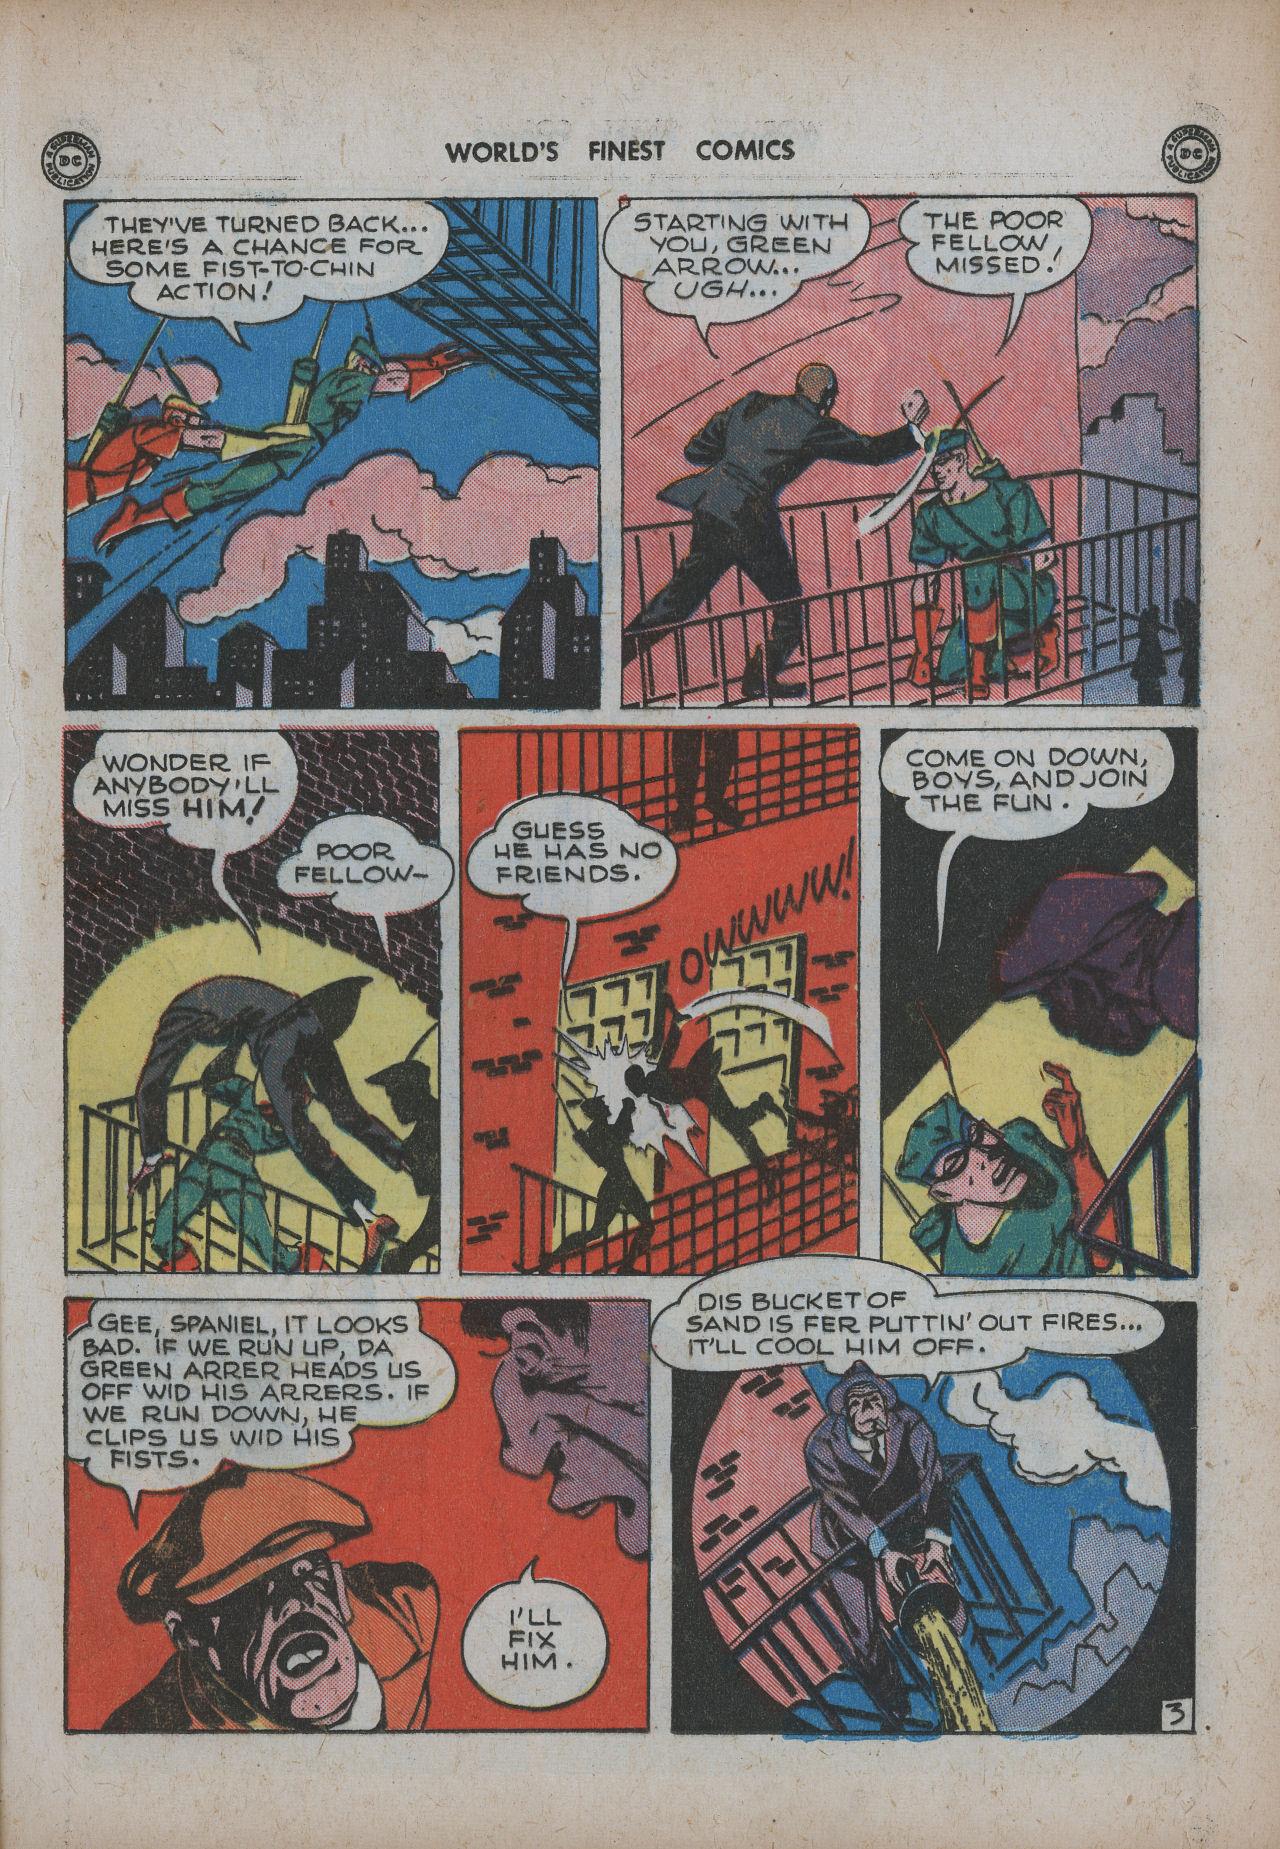 Read online World's Finest Comics comic -  Issue #20 - 19